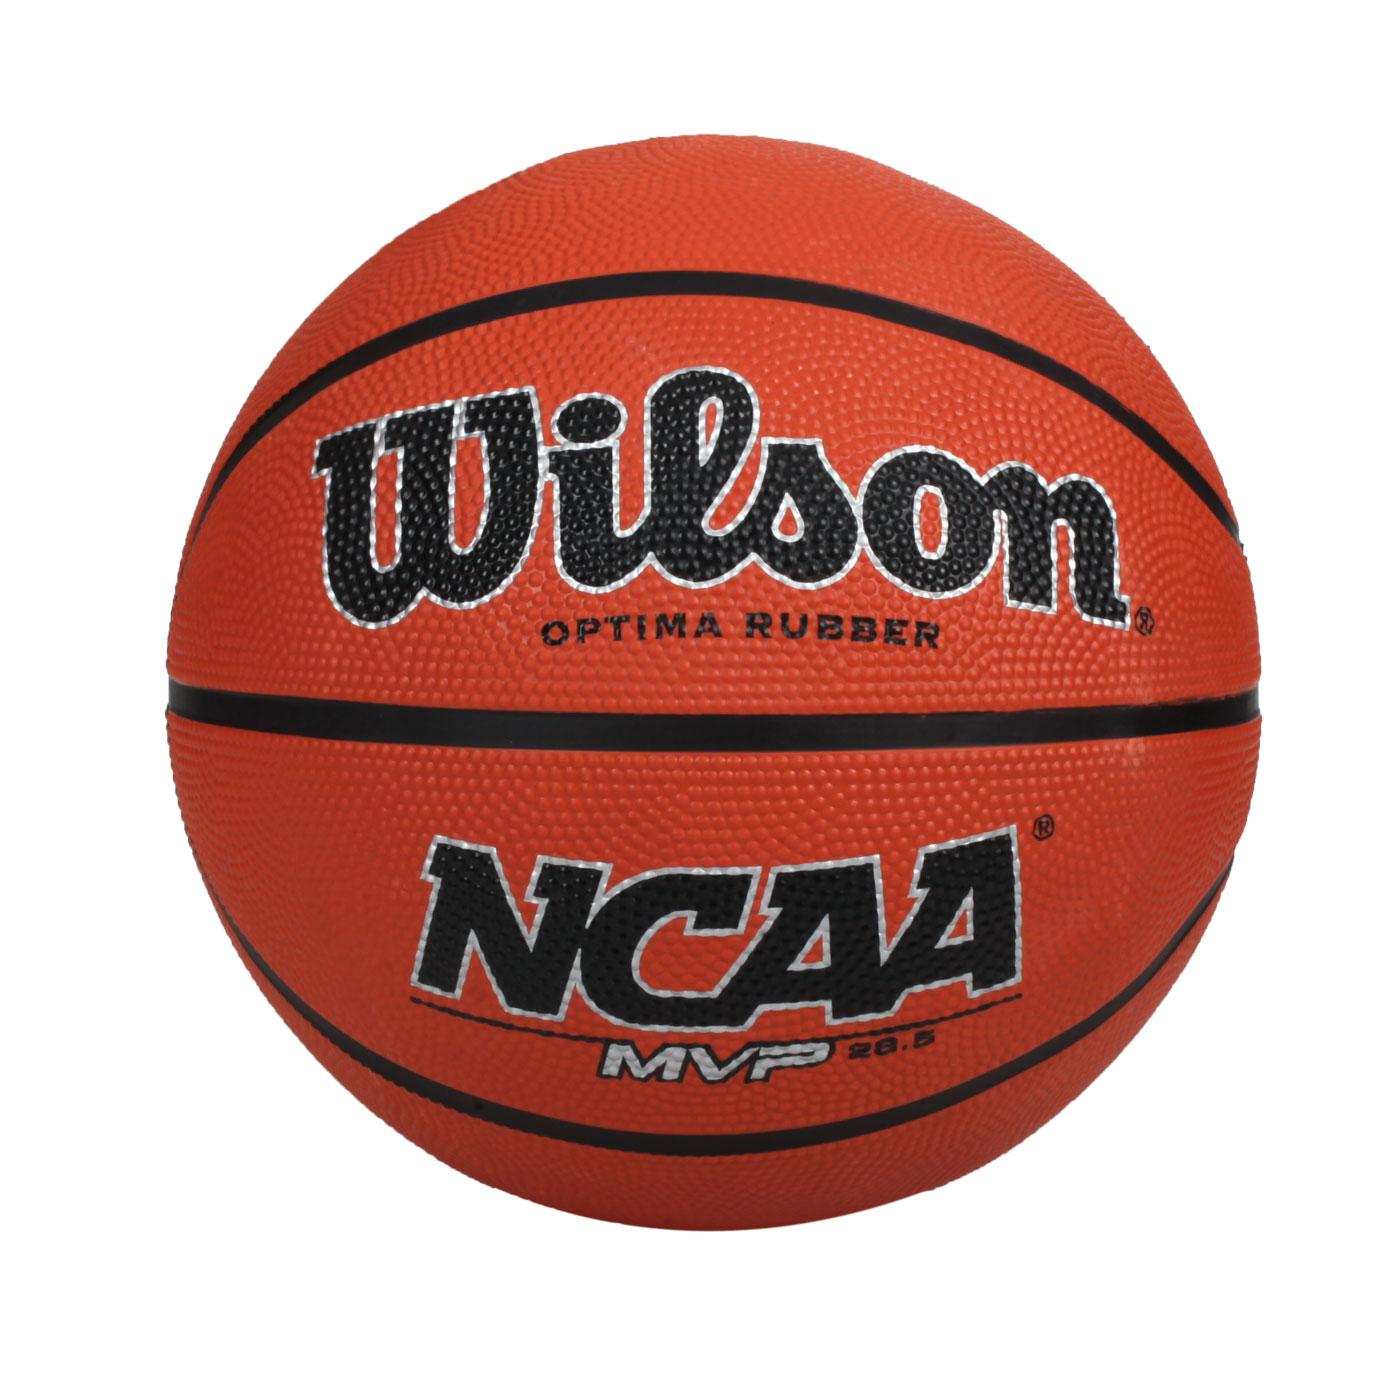 WILSON NCAA MVP 橡膠籃球#6 WTB0761XDEF - 橘黑